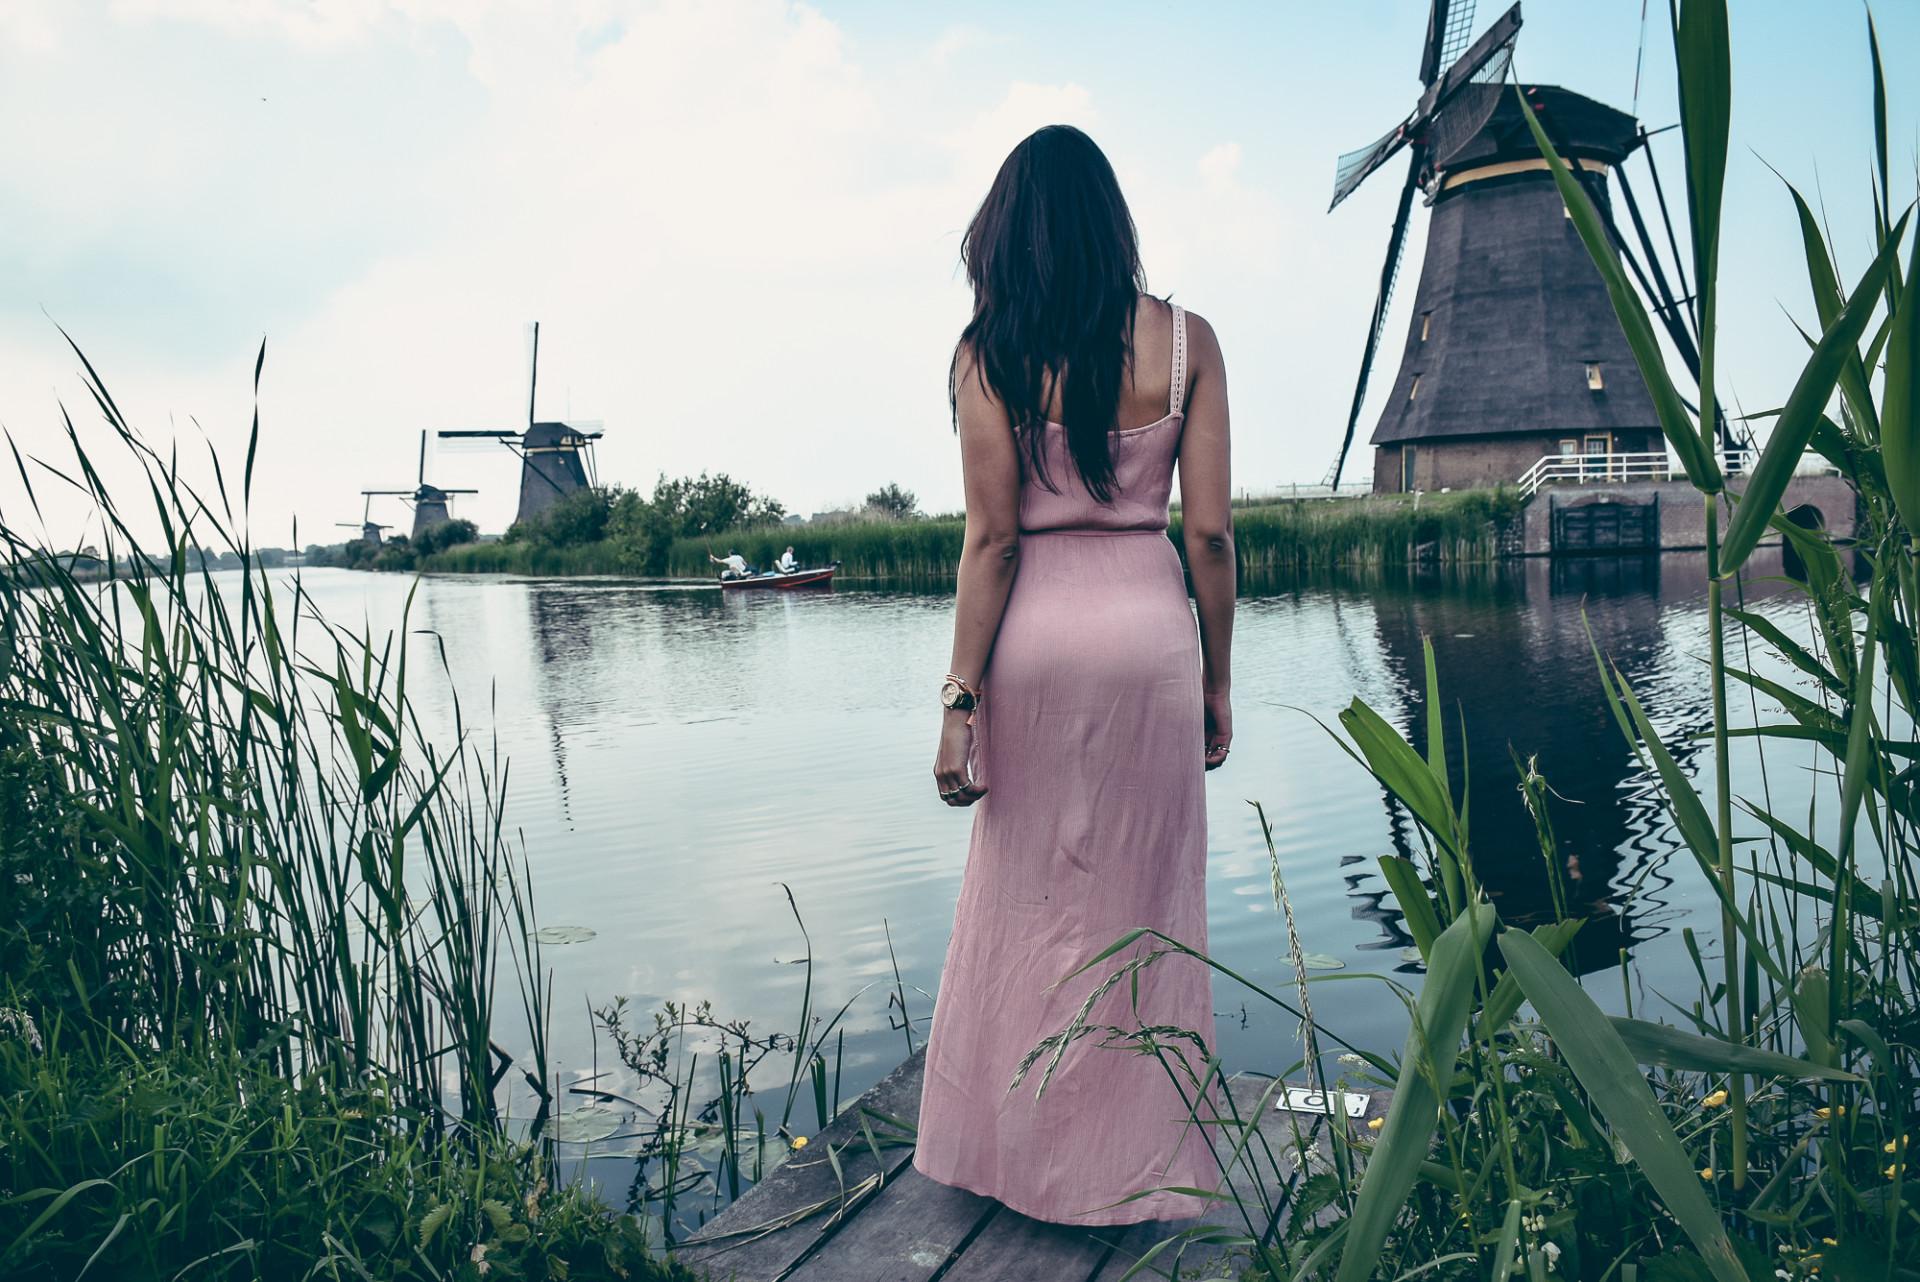 kinderdijk windmills photography